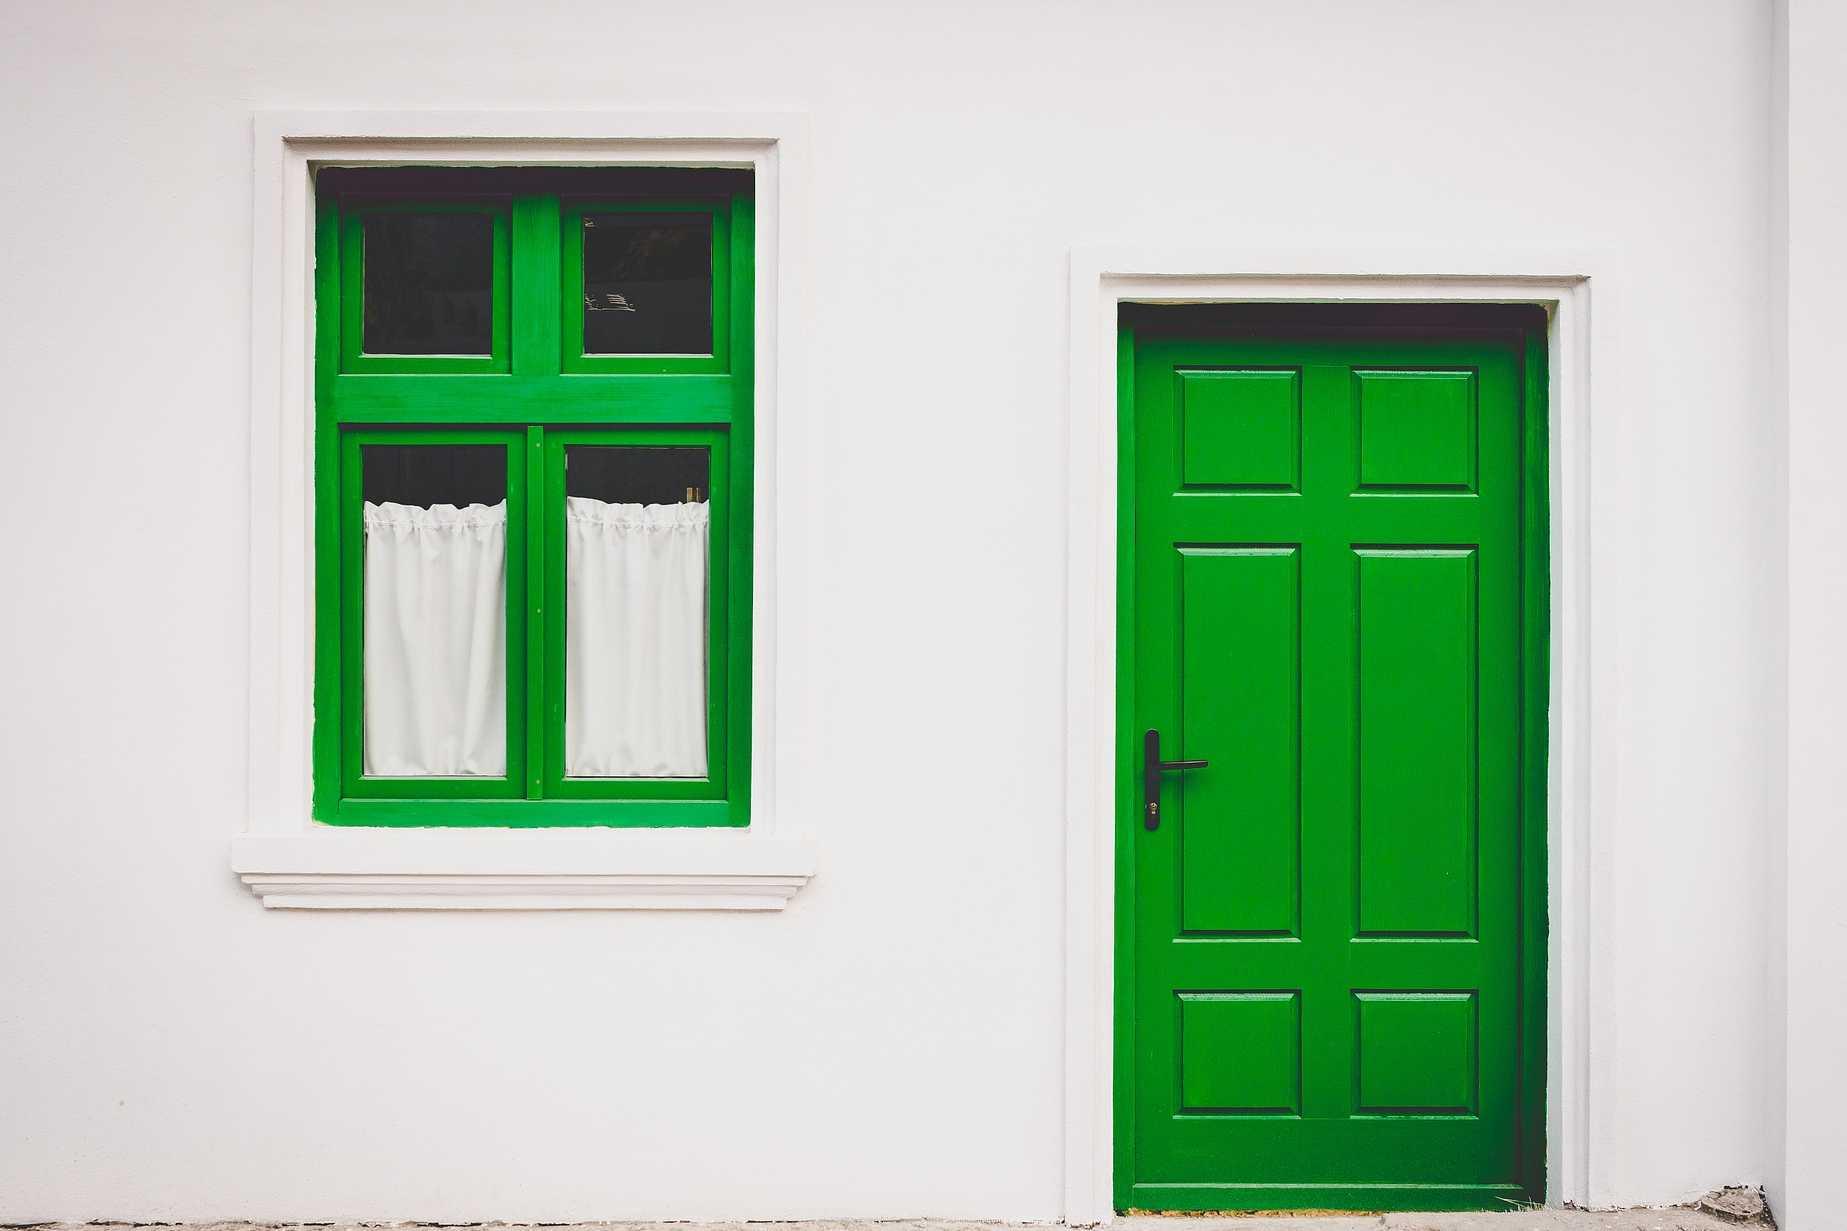 Green Building 2